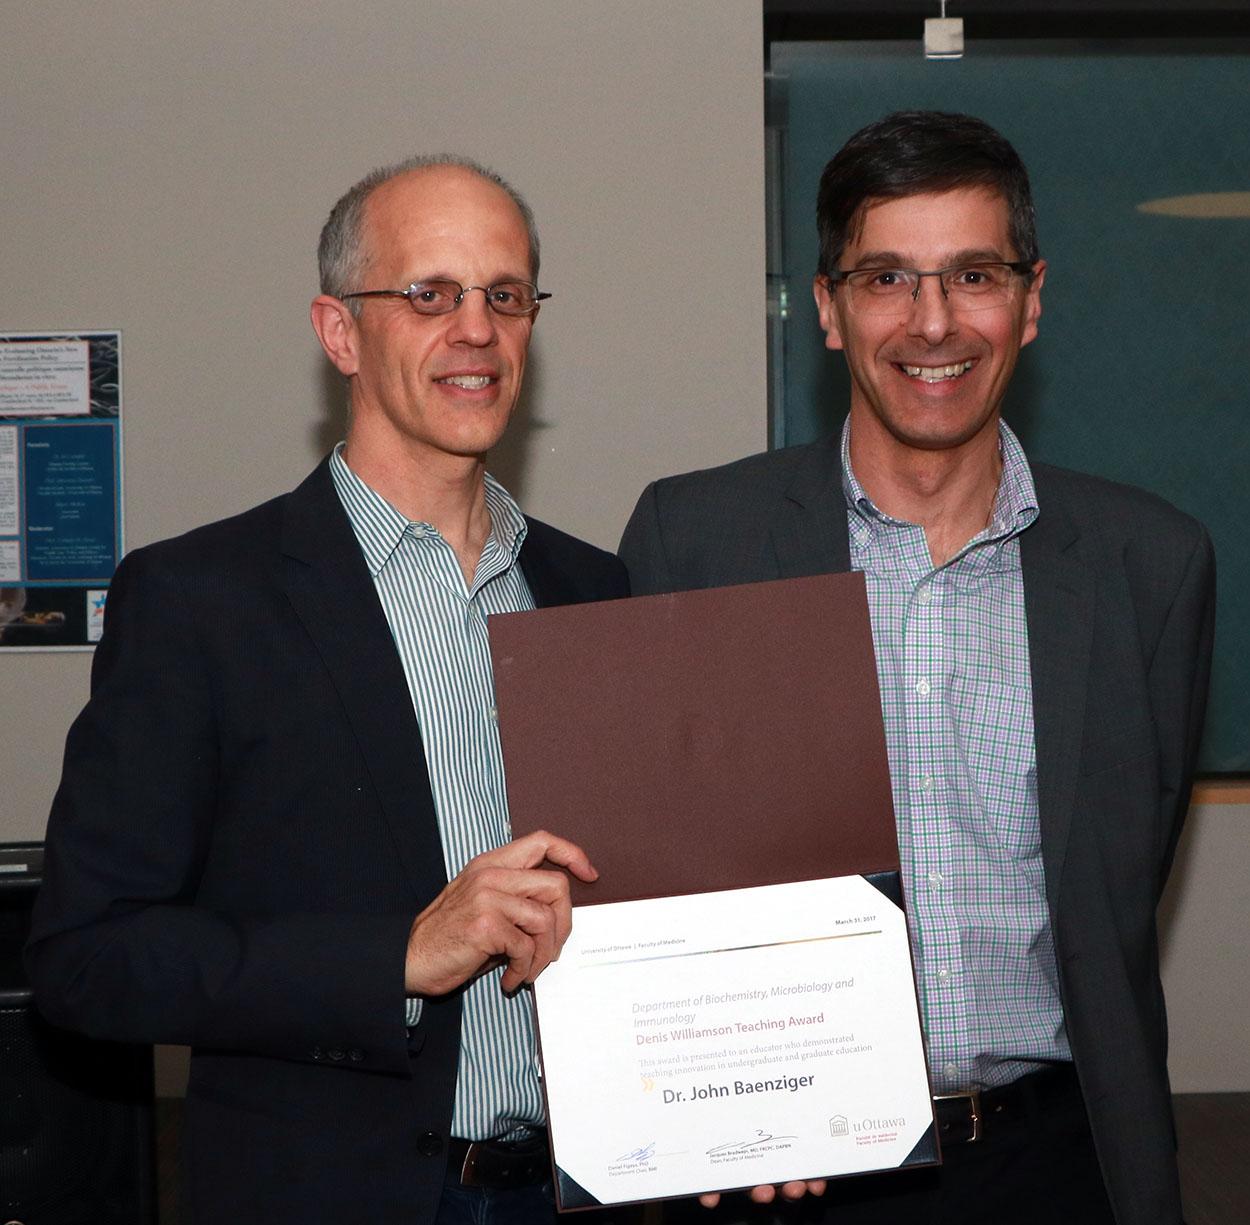 Dr. John Baenziger accepting a award from Dr. Daniel Figeys